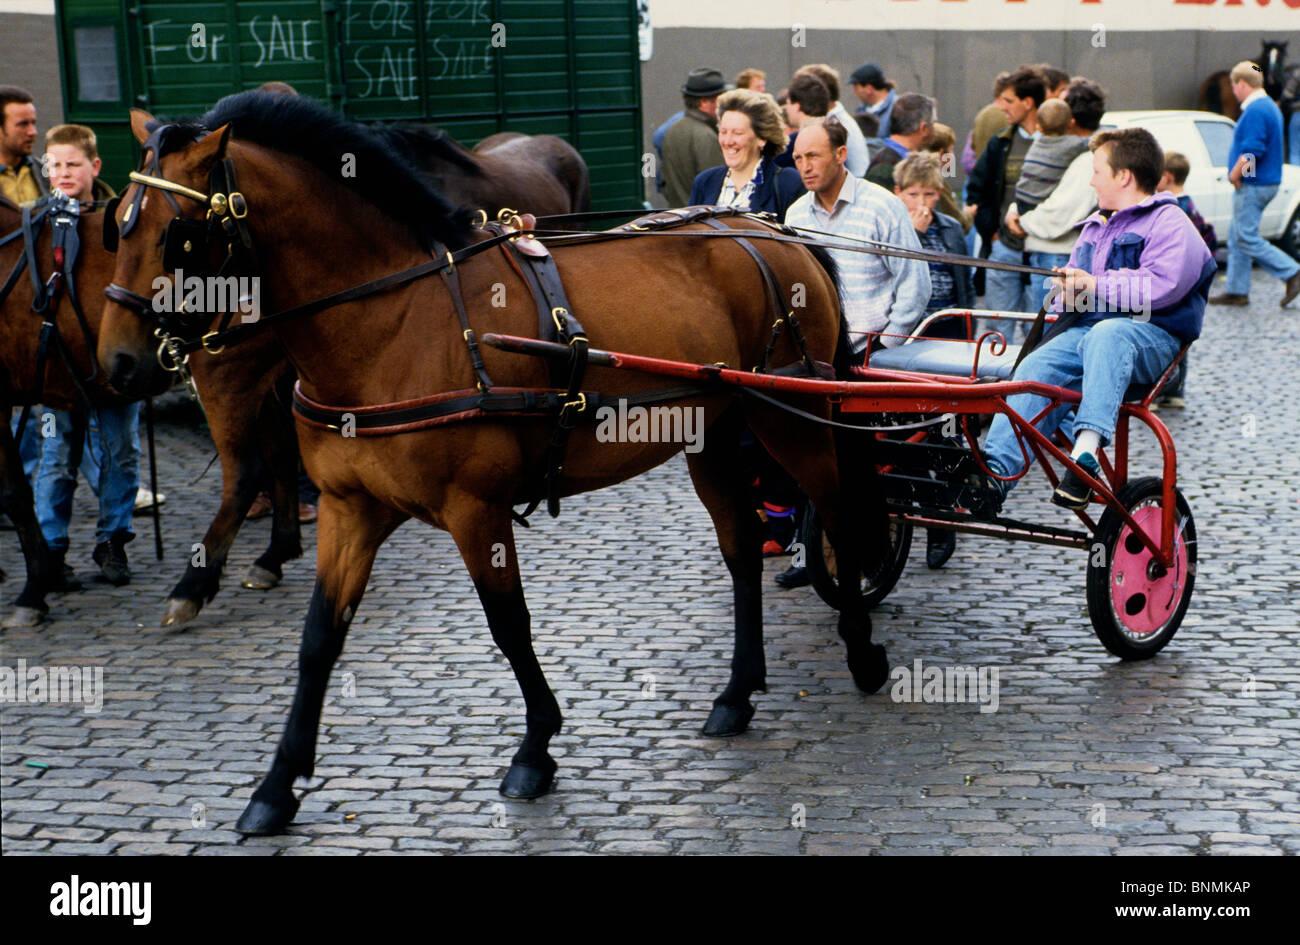 Boys show their ponies at Smithfield market Dublin Ireland - Stock Image